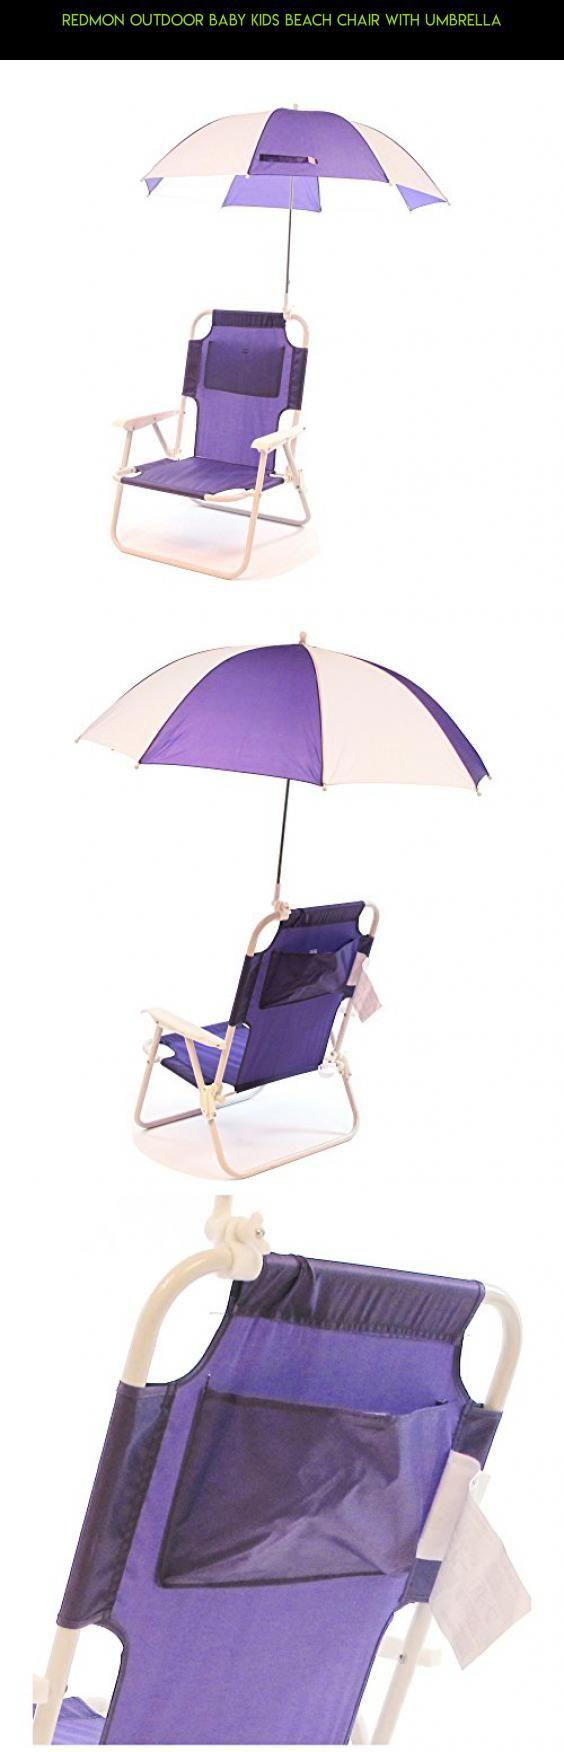 Oahu beach chair rental hawaii beach time - Best 25 Beach Chair With Umbrella Ideas On Pinterest Beach Fairy Garden Beach Chairs On Sale And Beach Gardens